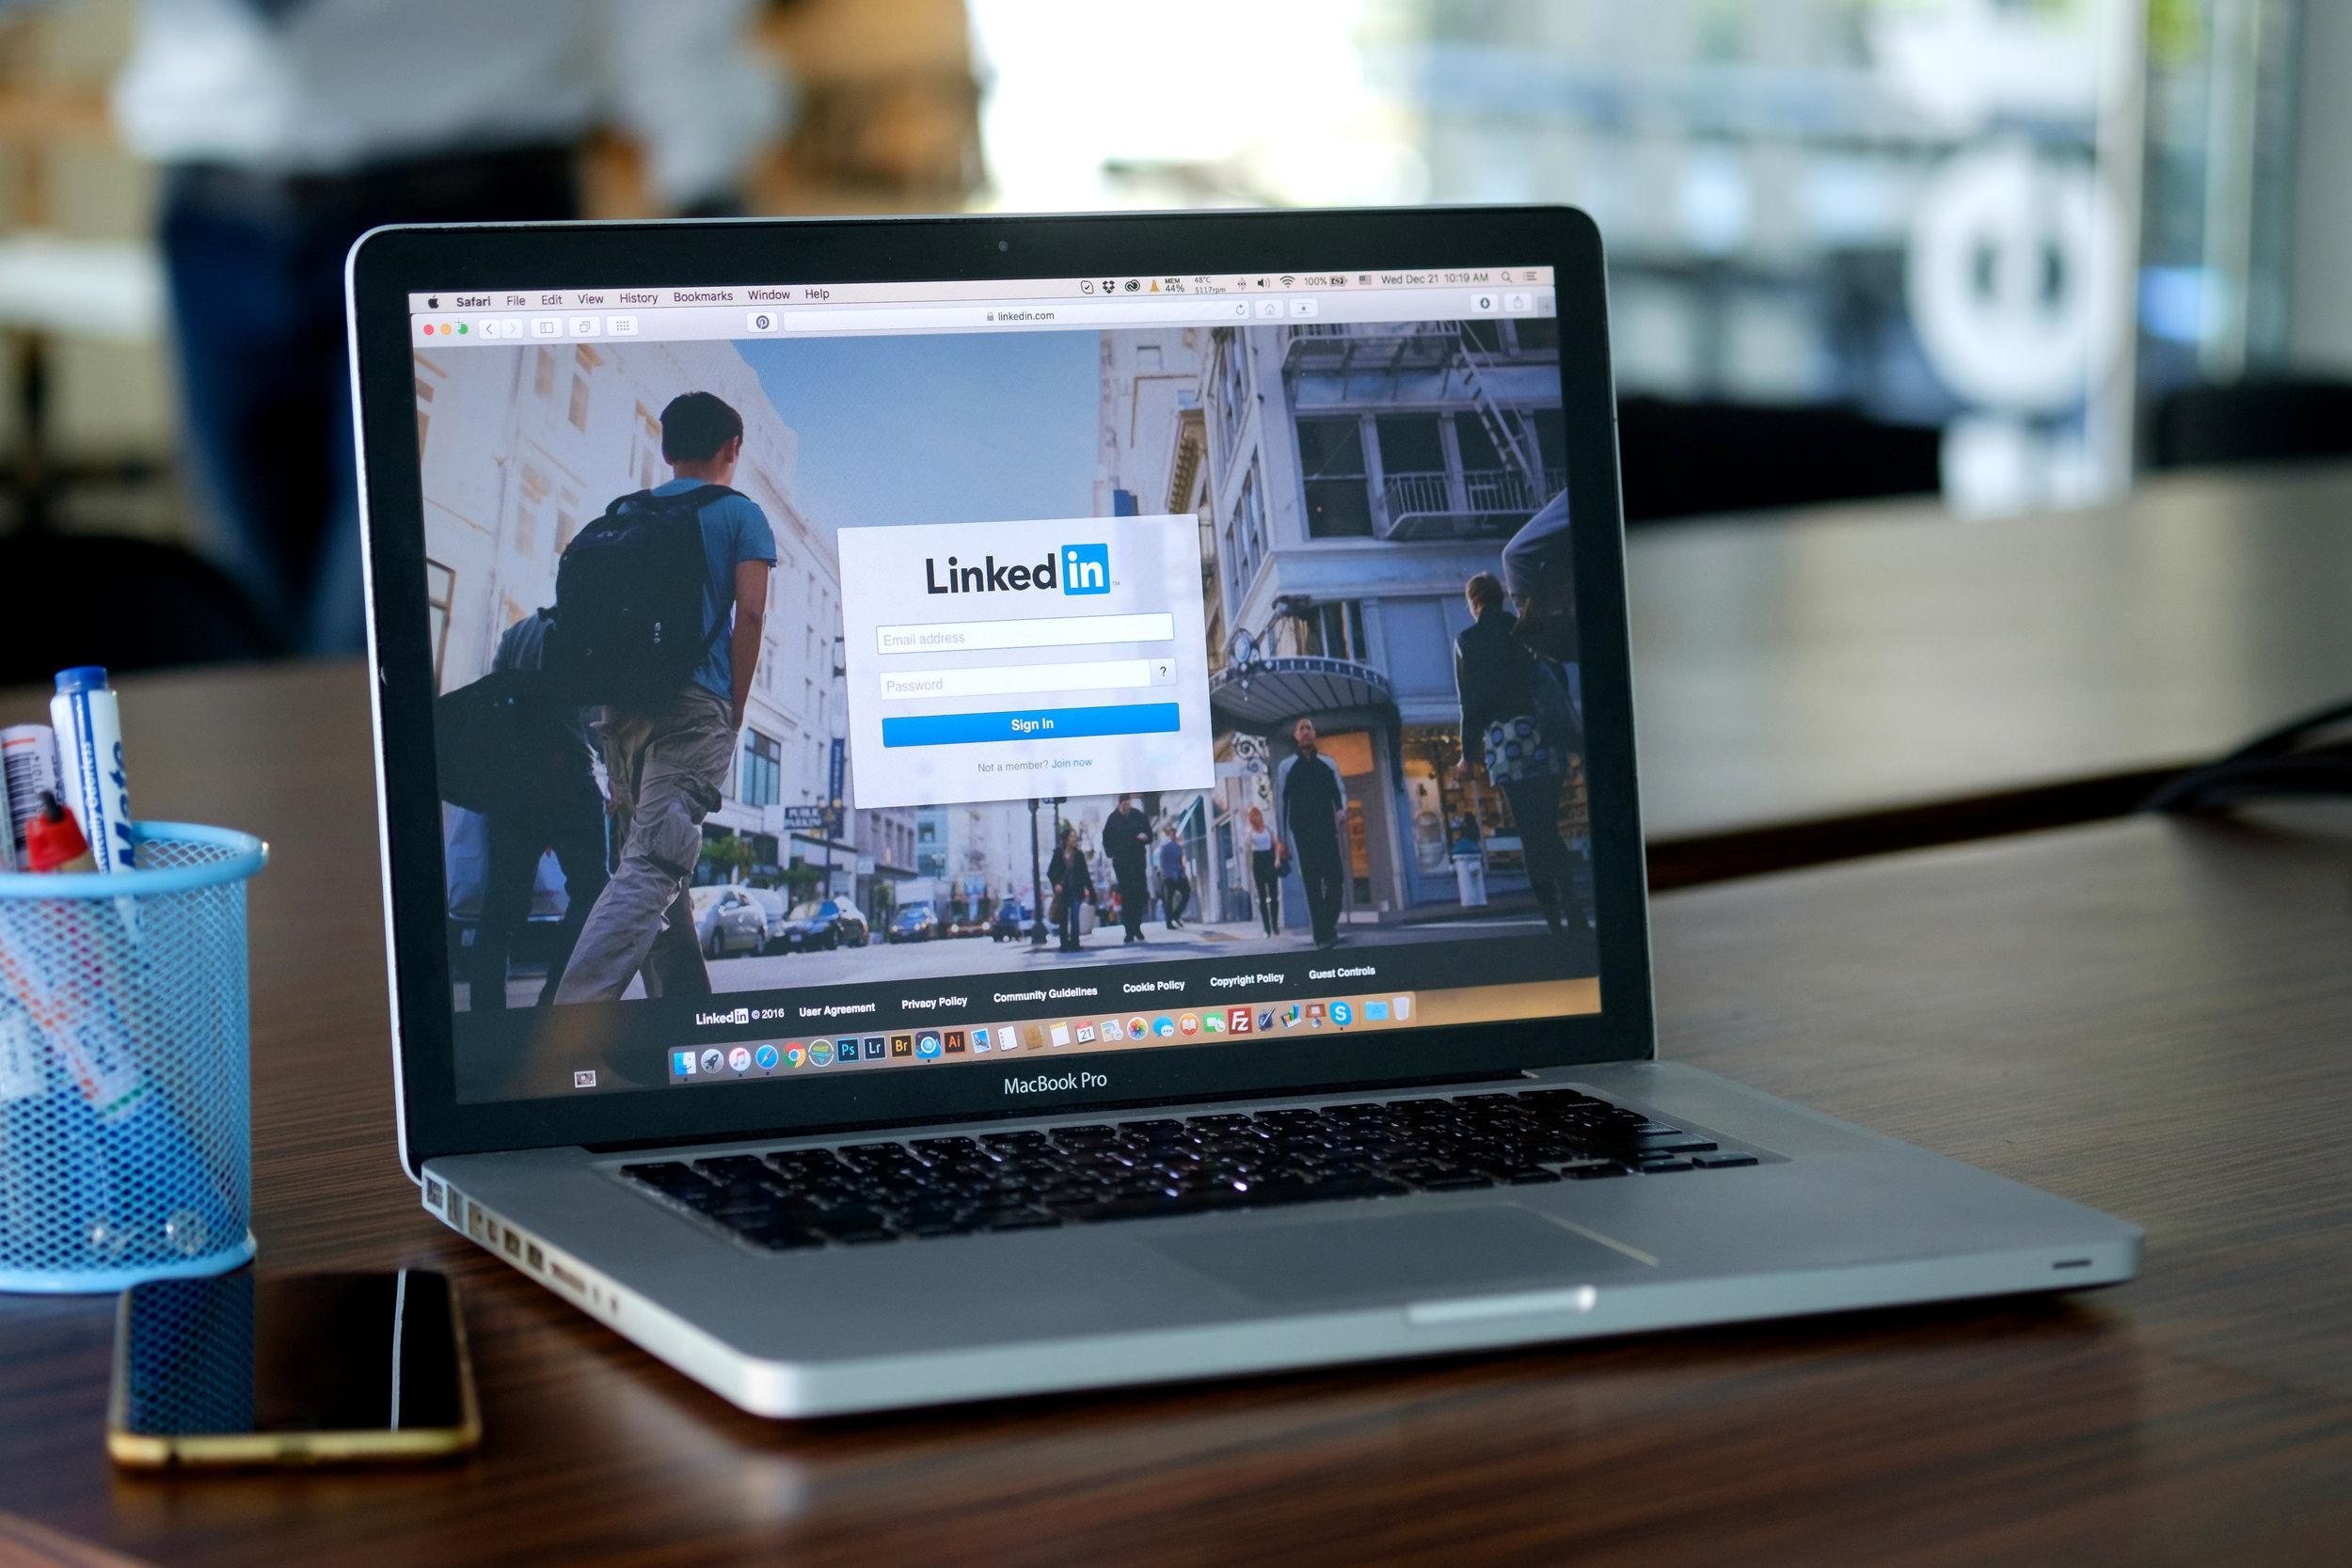 Improve your LinkedIn profile's SEO